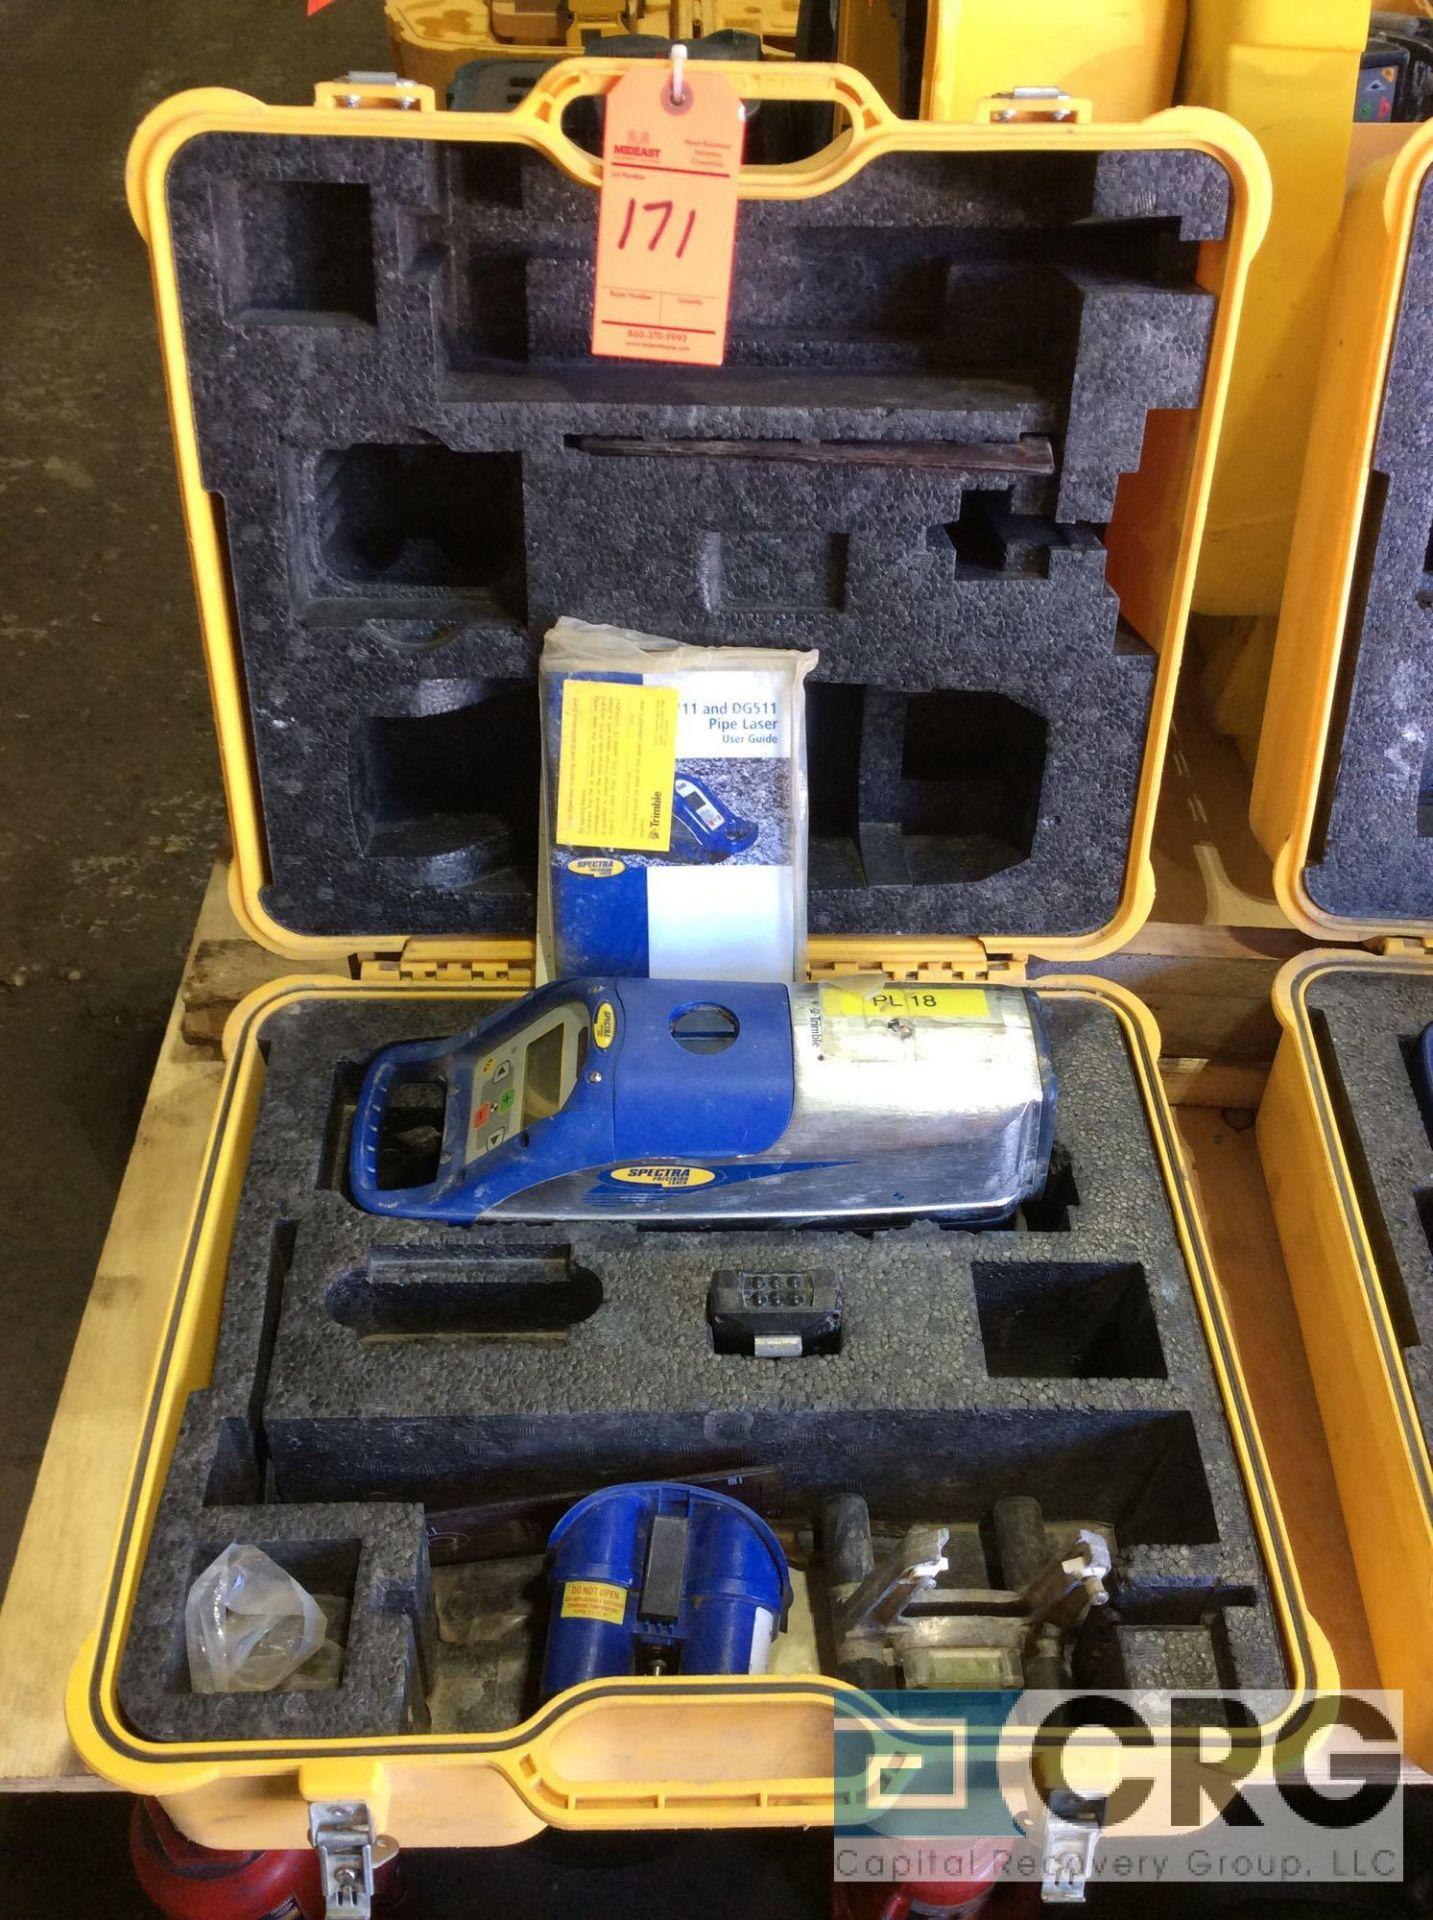 Lot 171 - Trimble DG711 Spectra Precision pipe laser with case